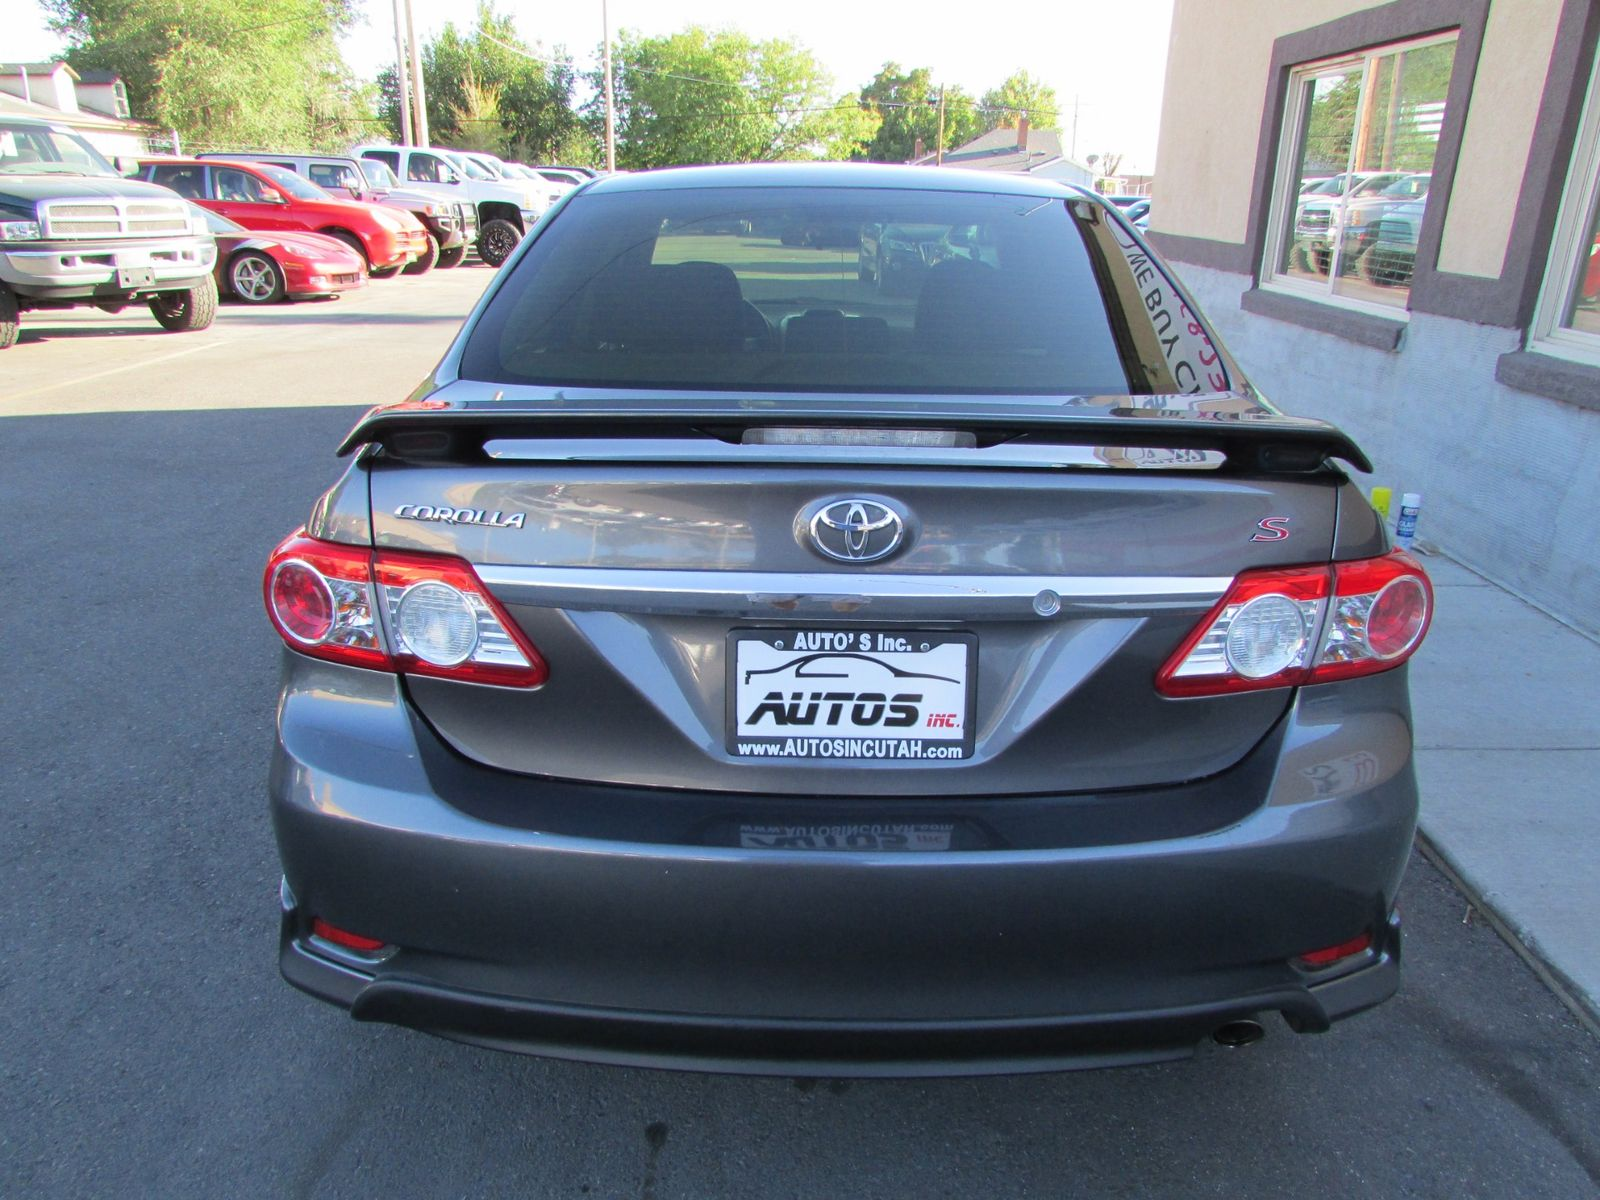 2013 Toyota Corolla S city Utah Autos Inc